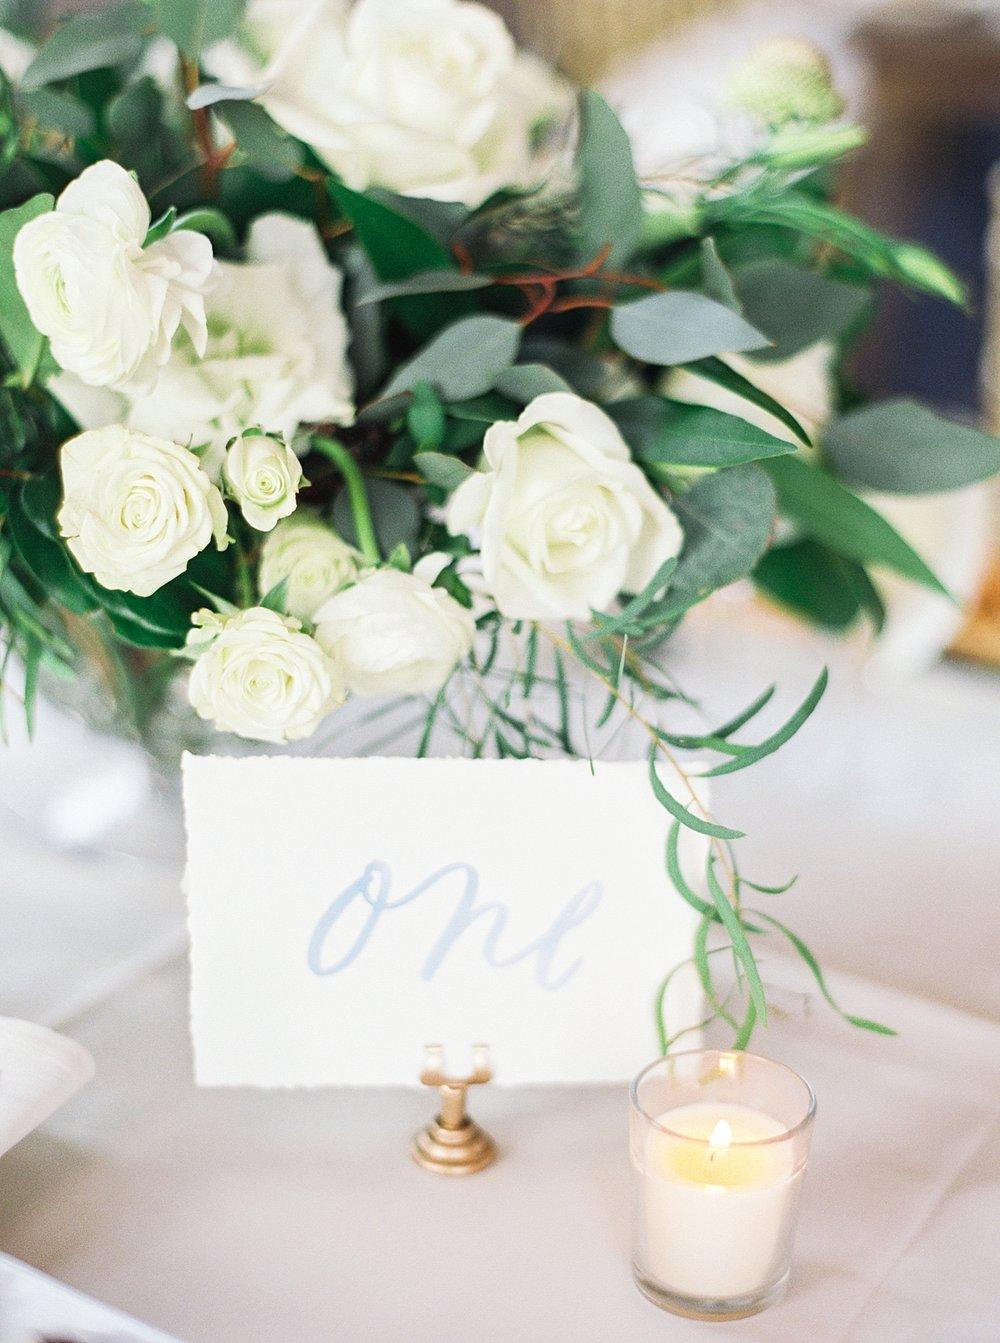 bonnet_island_estate_lbi_nj_wedding_photos_0046.jpg